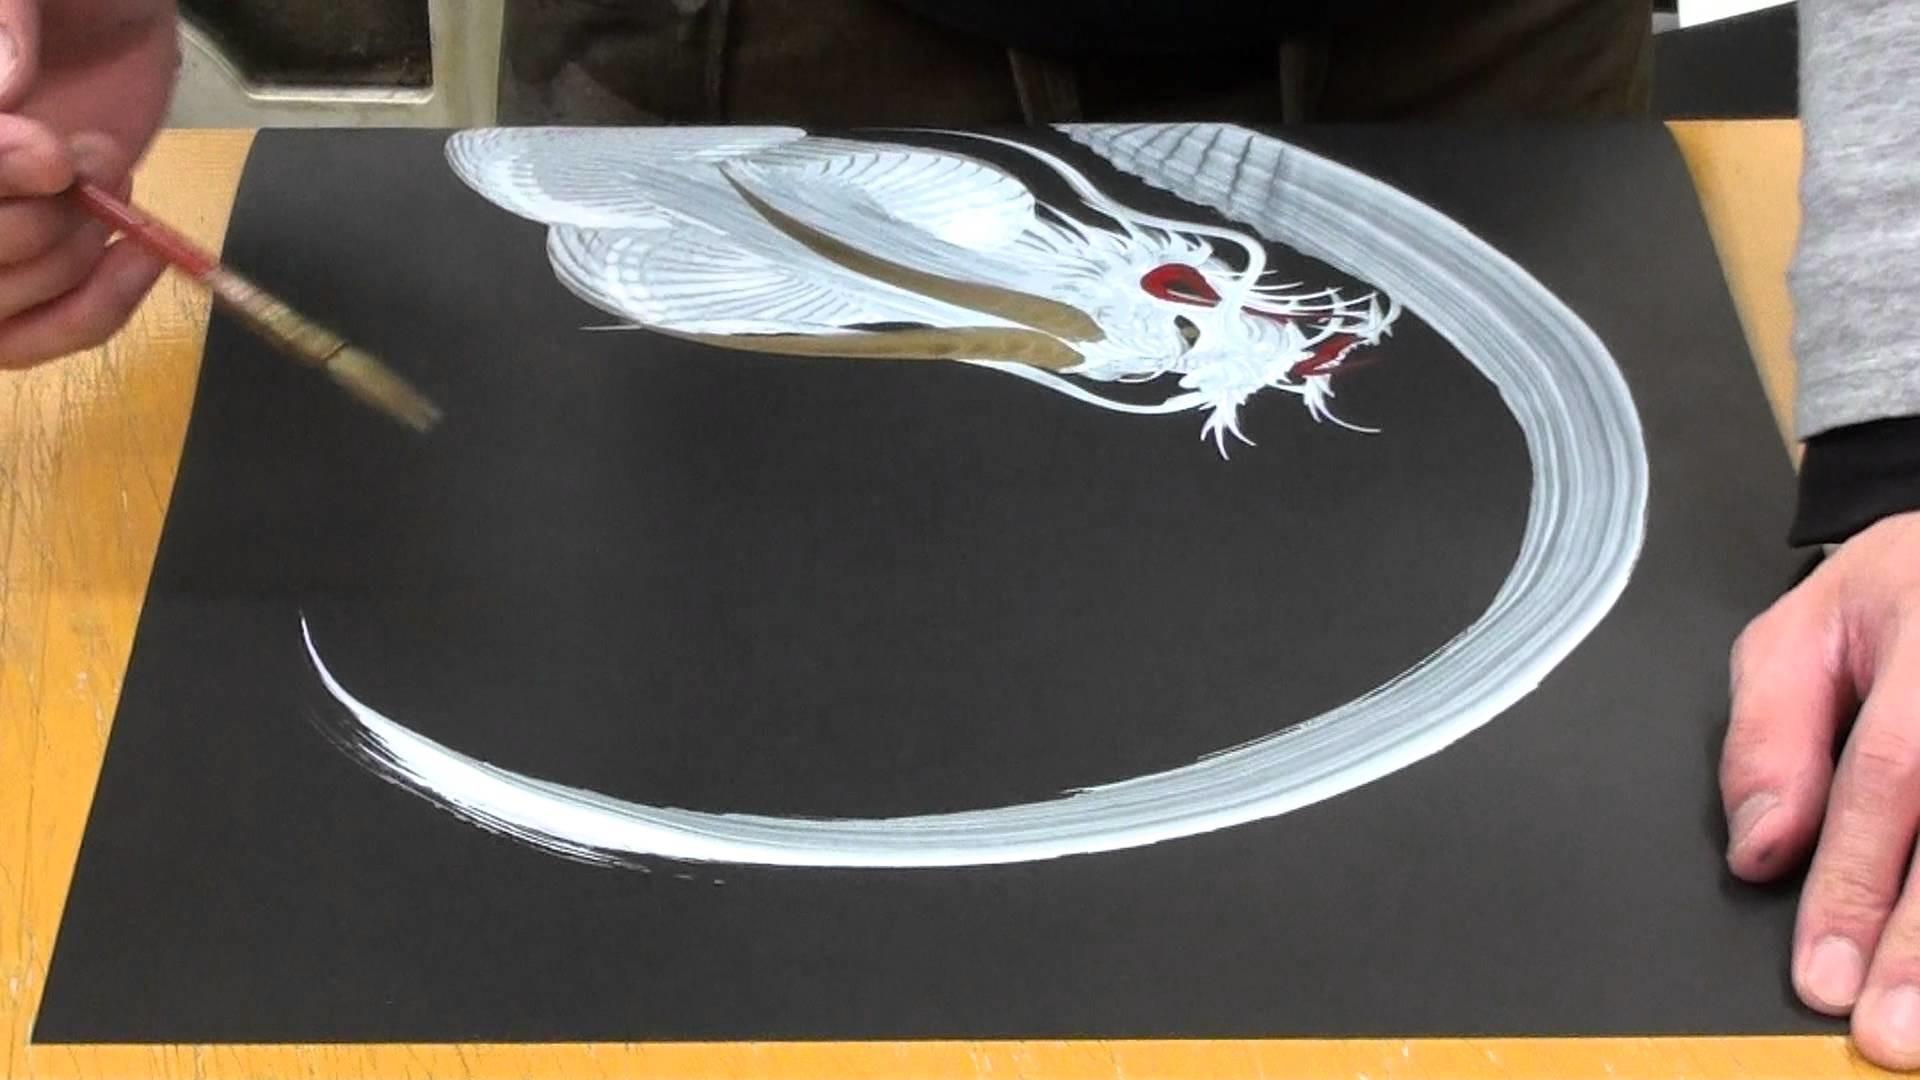 Japanese Dragon Painting at Nikko - Japan 2.3